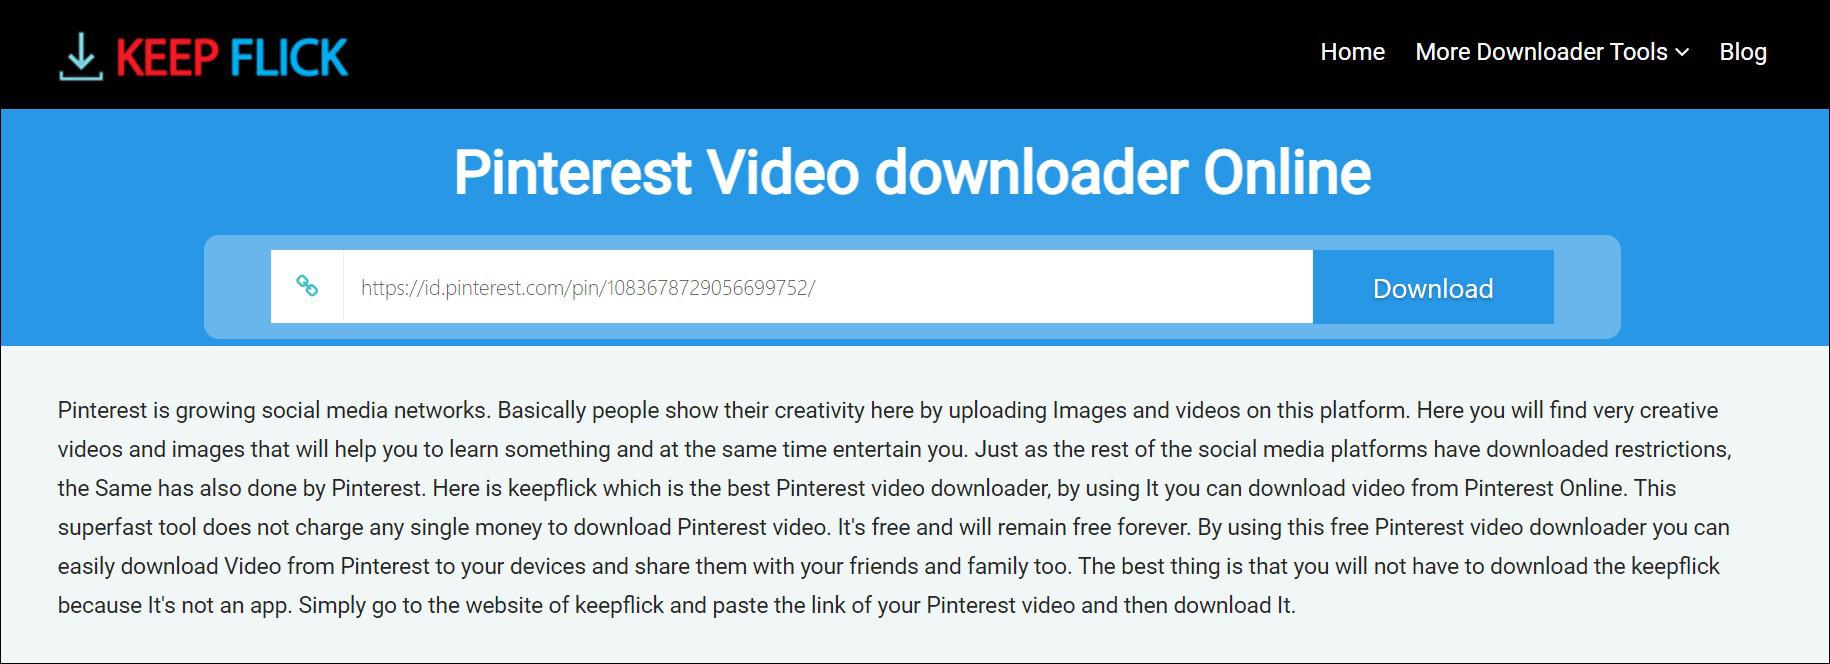 1 Buka halaman download KEEP FLICK